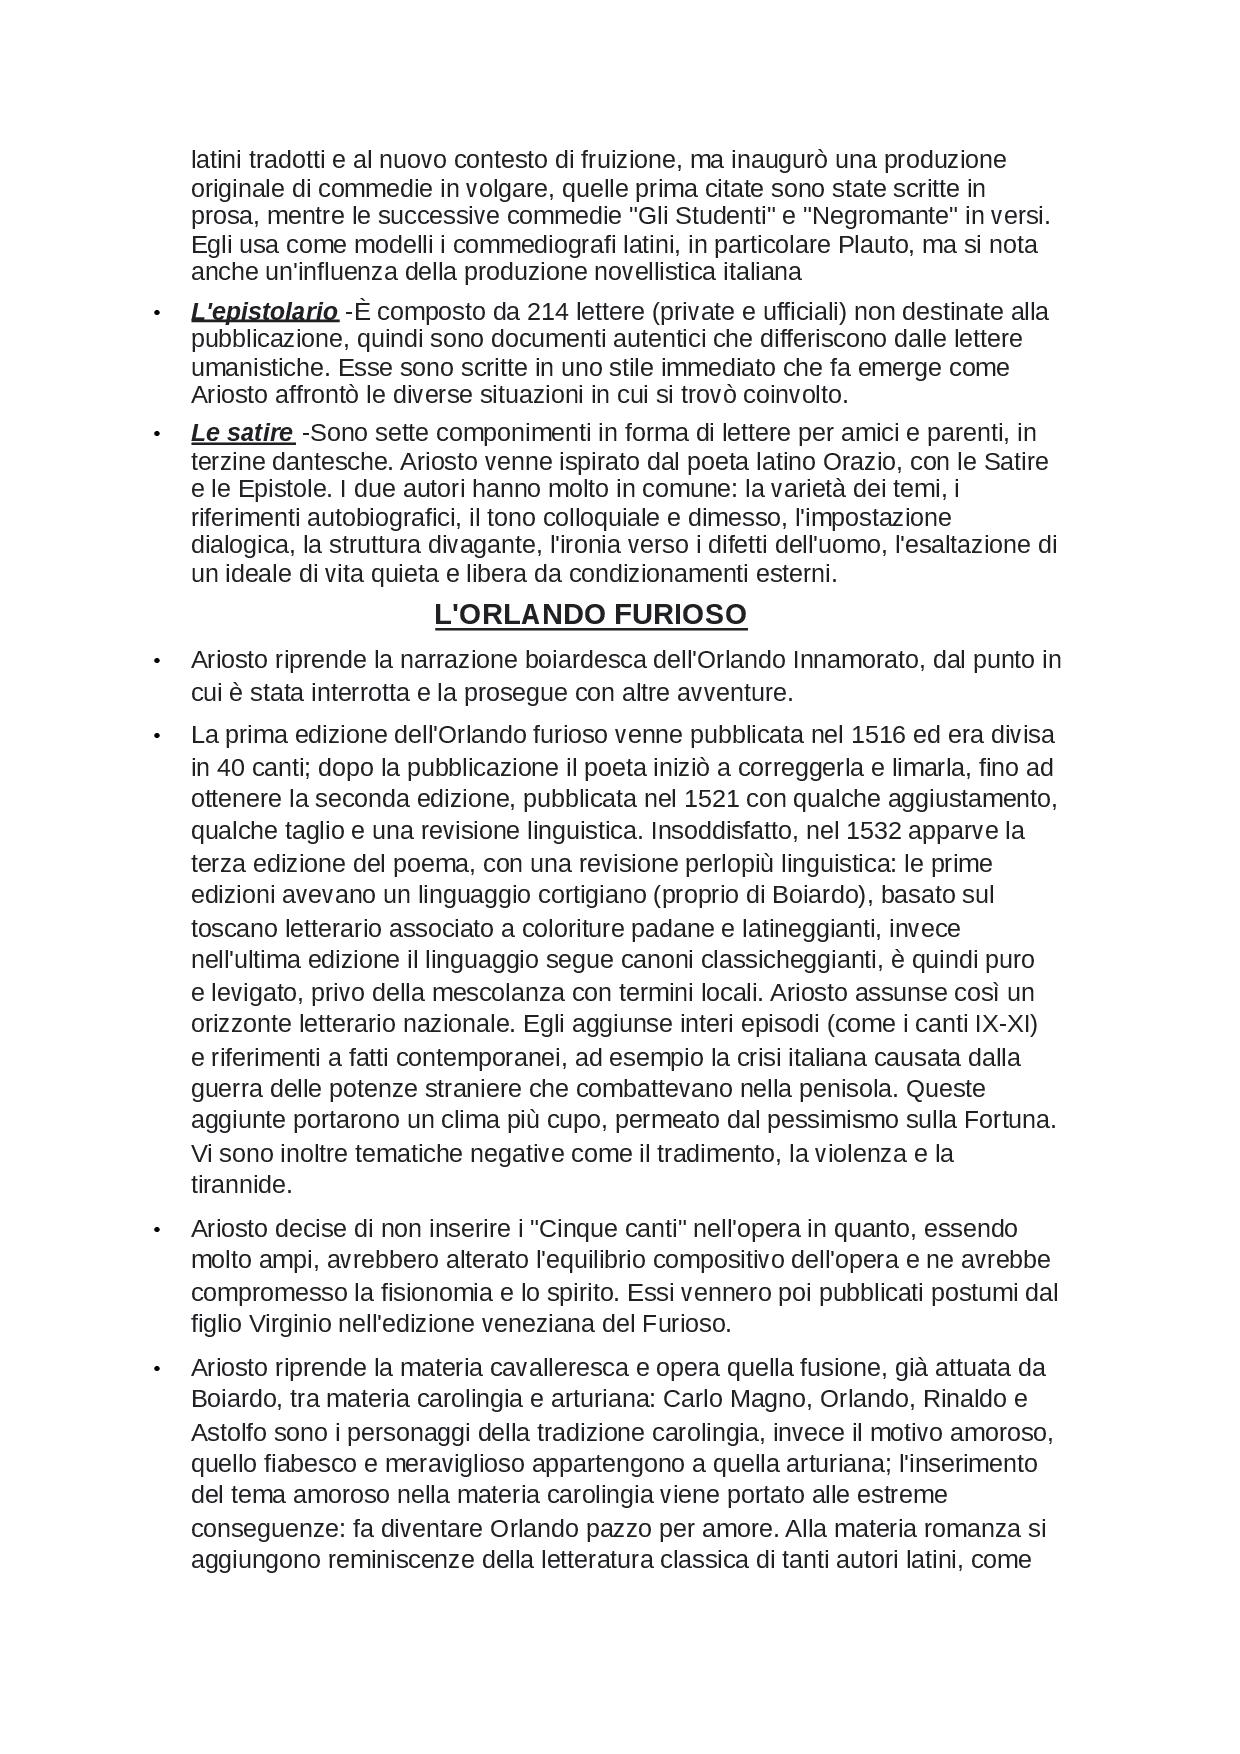 Caratteri Generali Di Ariosto E Le Sue Opere - Docsity encequiconcerne Docsity